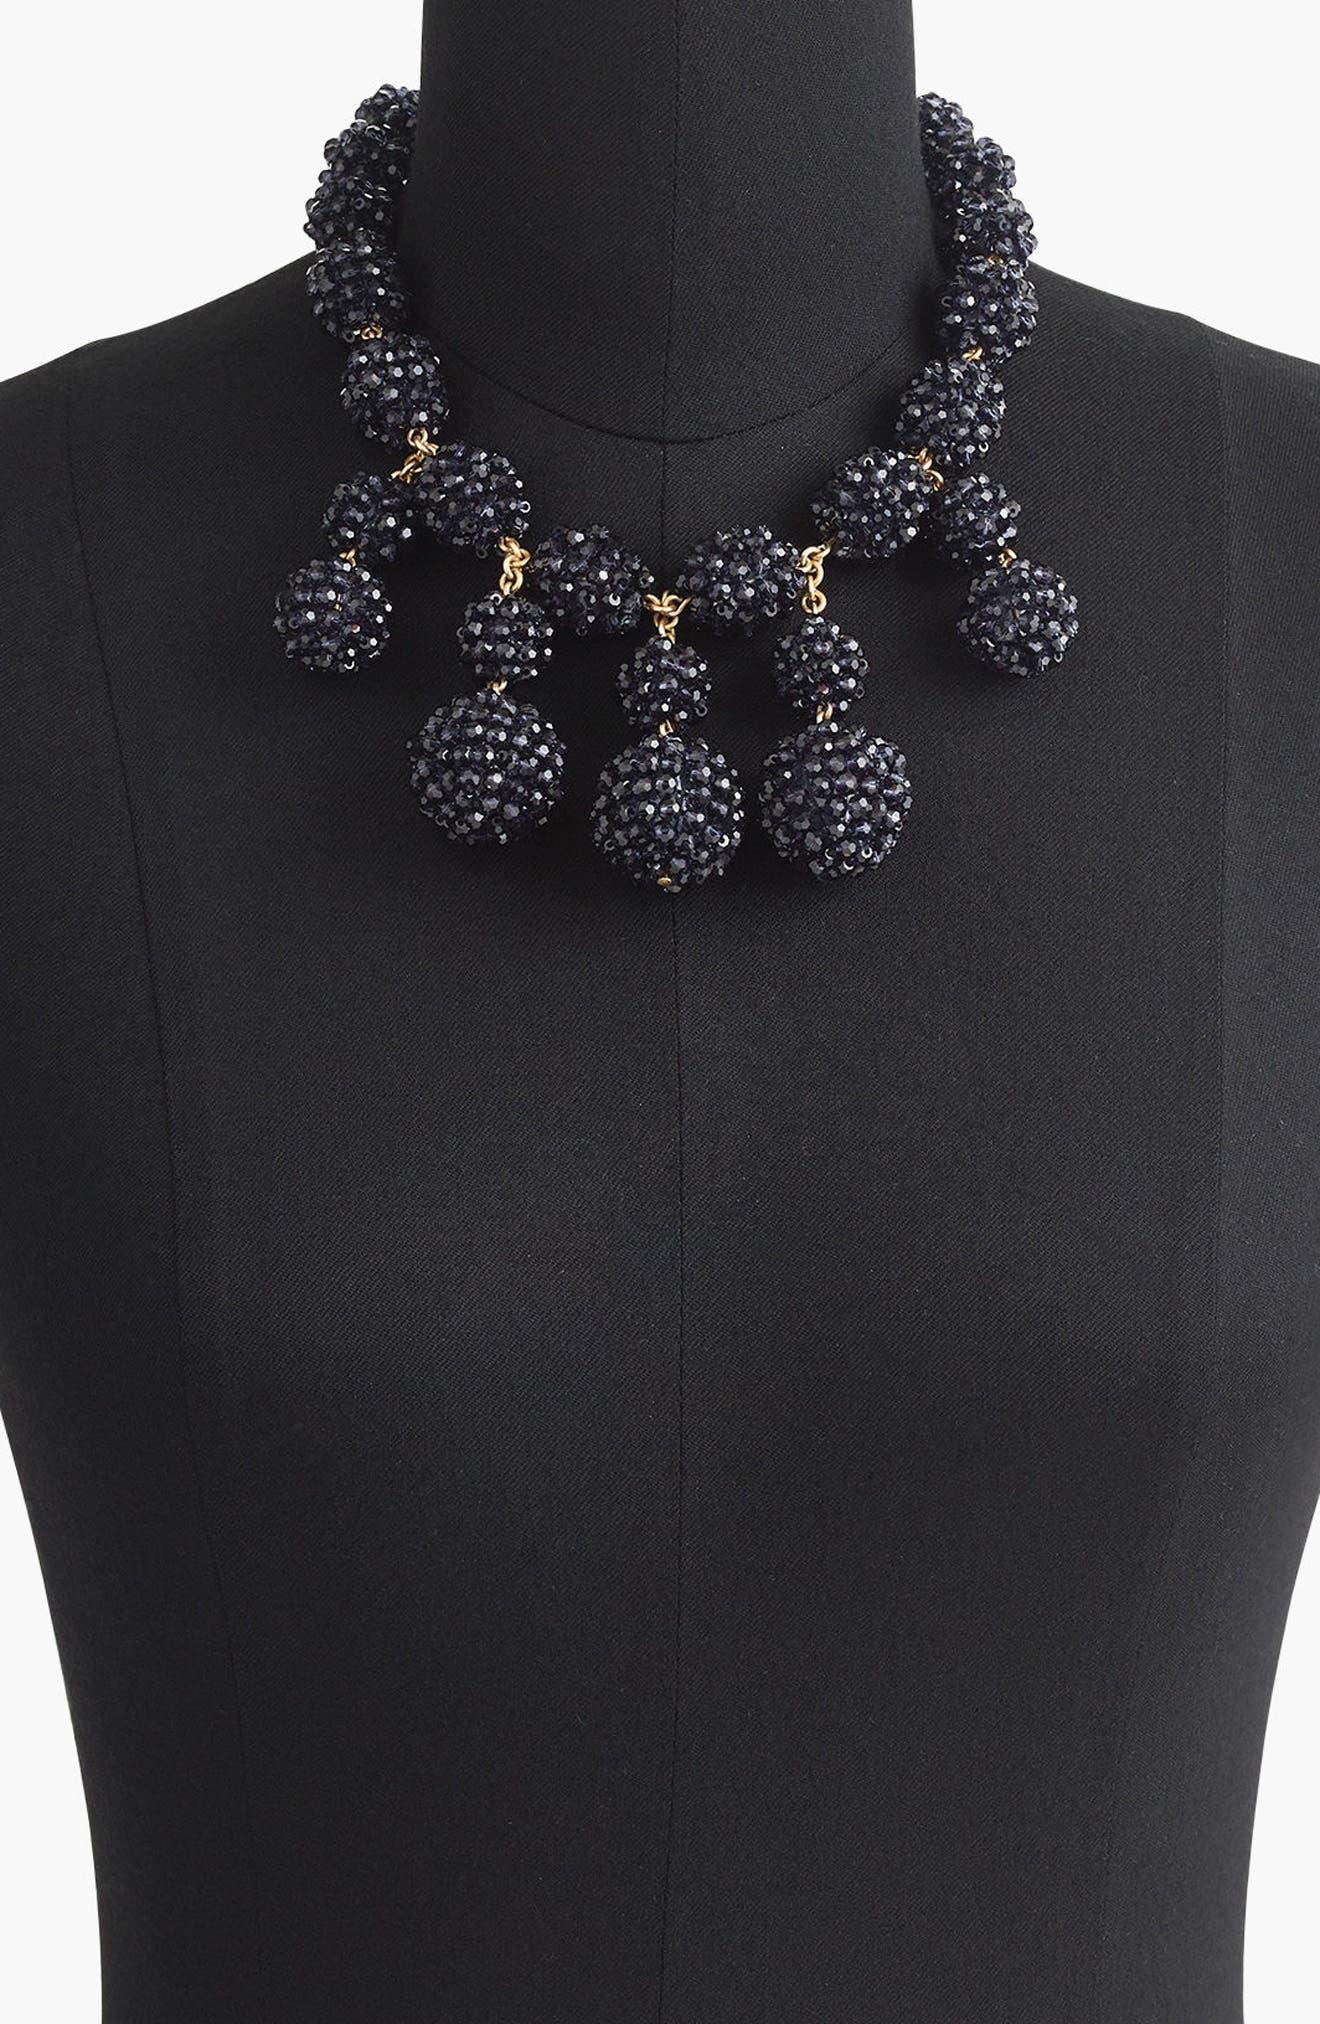 Blackberry Necklace,                             Alternate thumbnail 2, color,                             Vintage Indigo